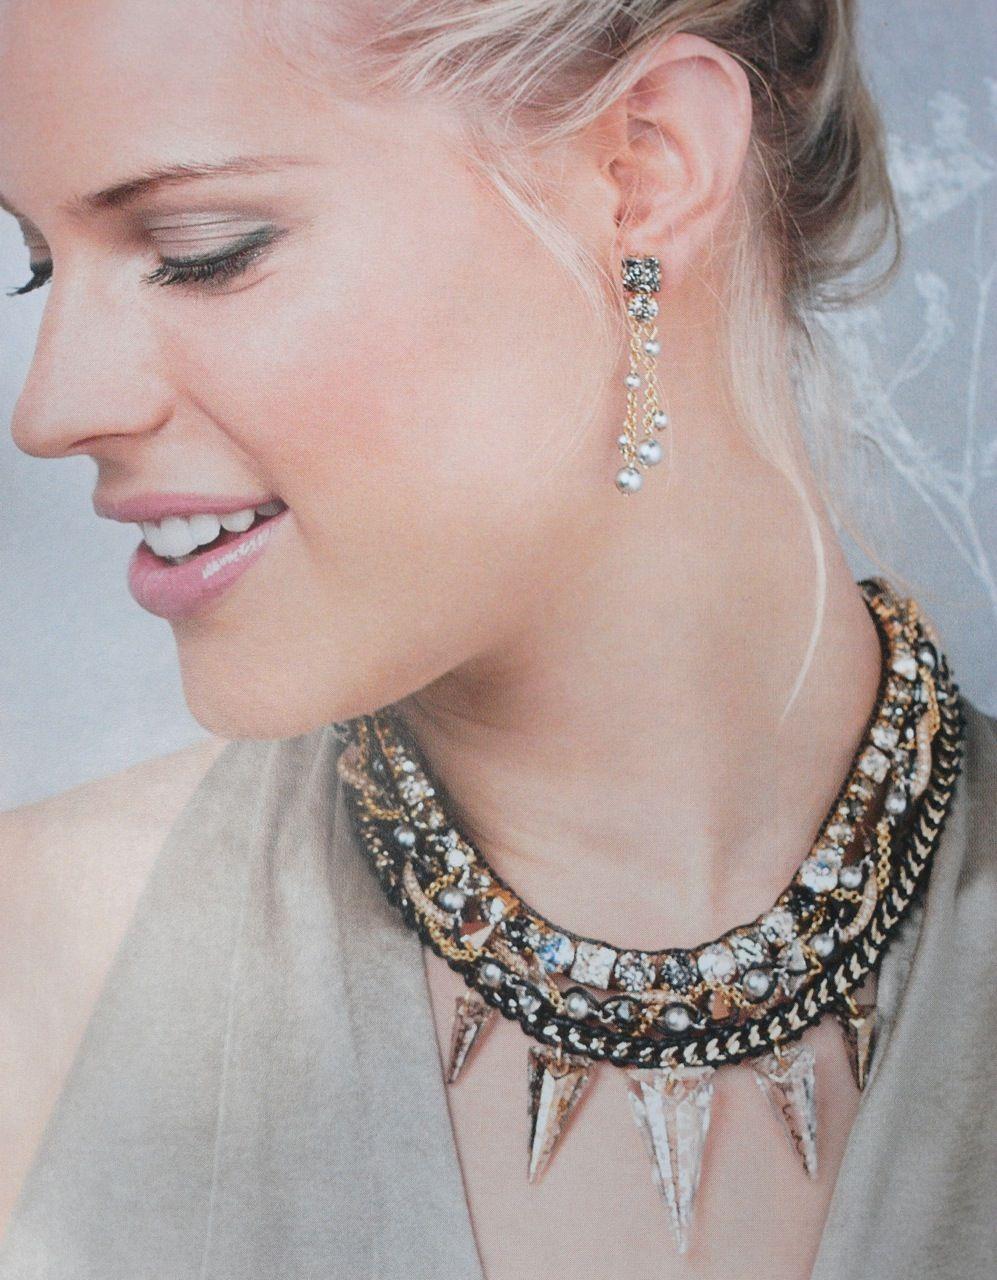 swarovski patina - Google Search | Beaded jewellery | Pinterest